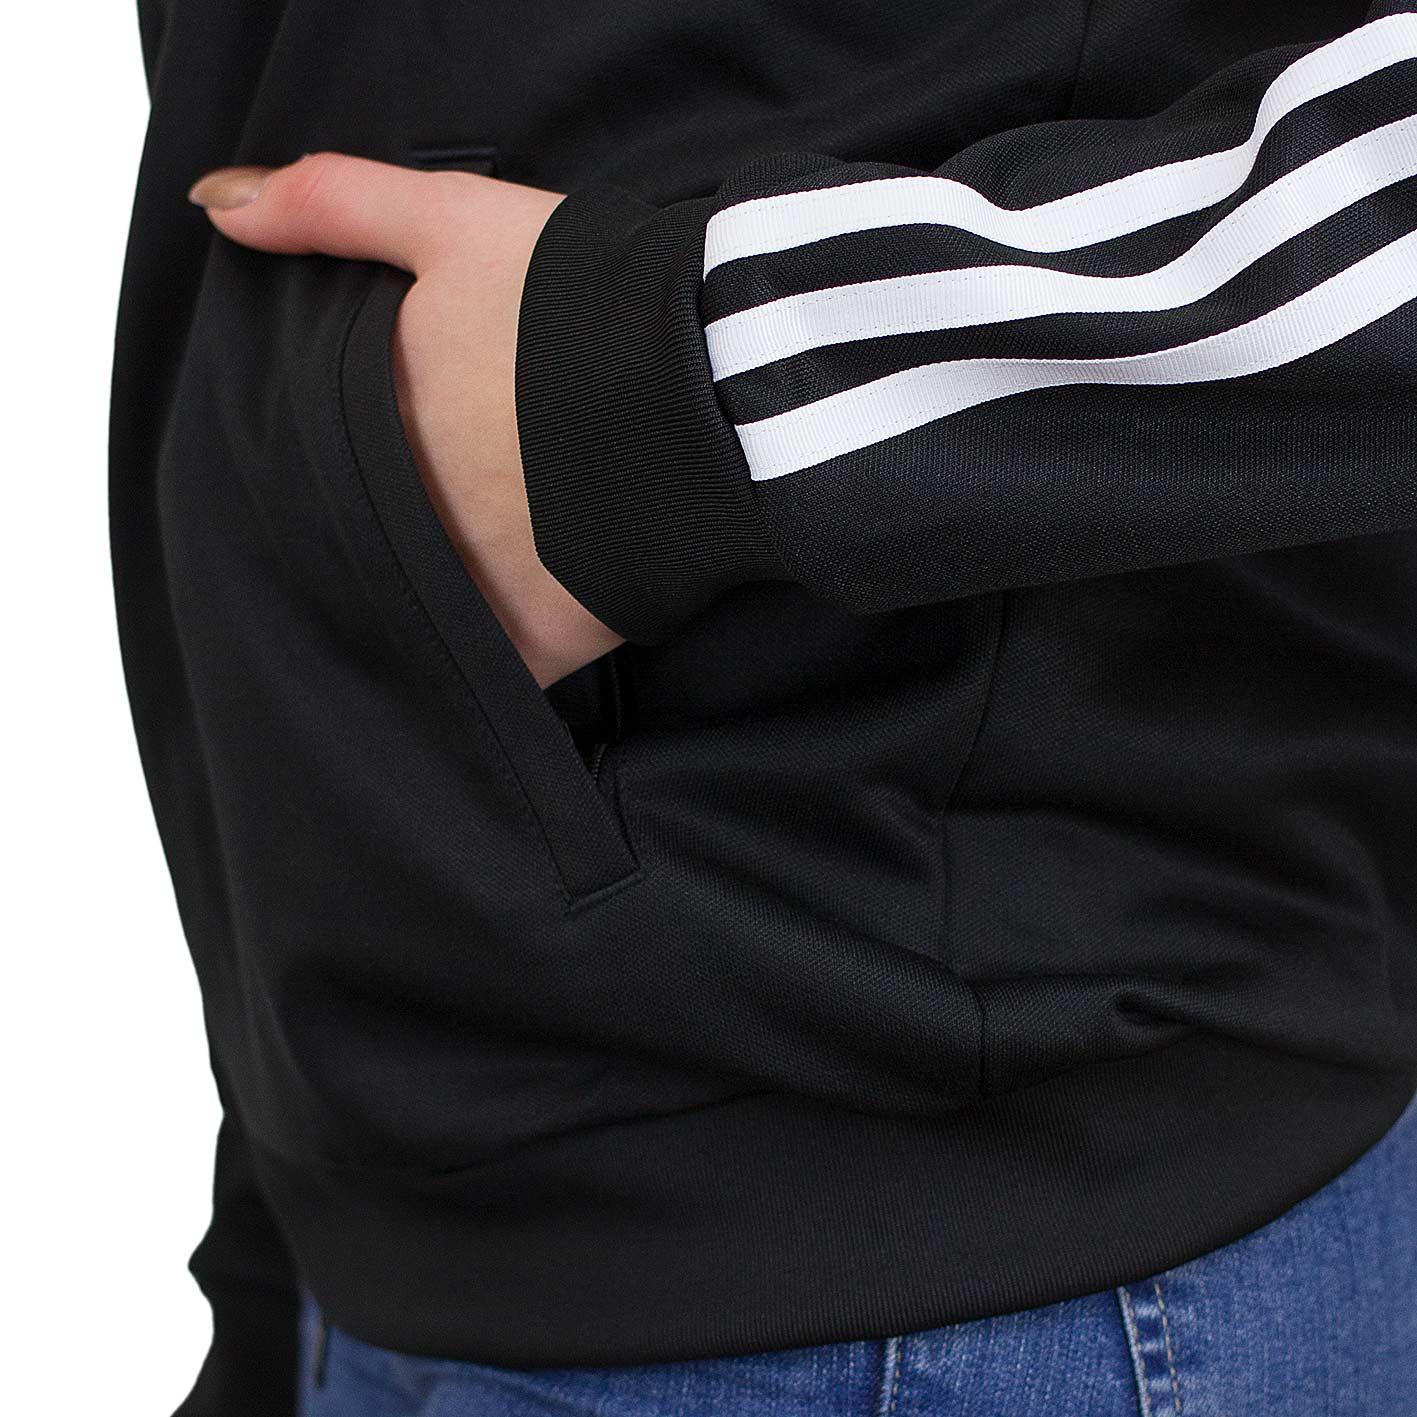 ☆ Adidas Originals Damen Trainingsjacke Contempt BB schwarz weiß ... 3cdef3e6c1